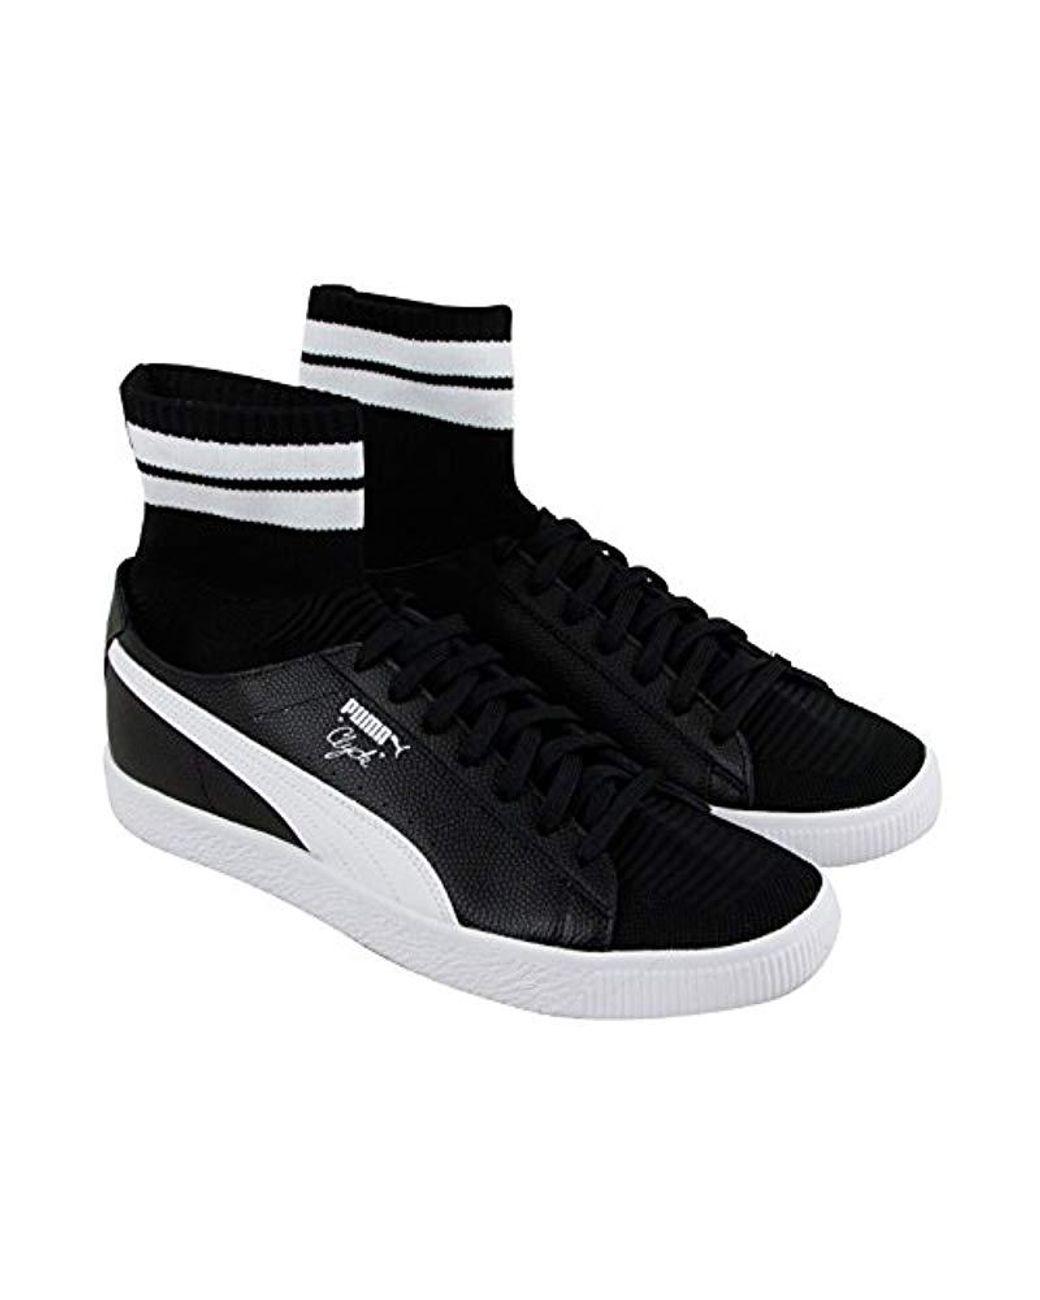 san francisco 8d827 126ec Men's Clyde Sock S Black Leather Lace Up Trainers Shoes